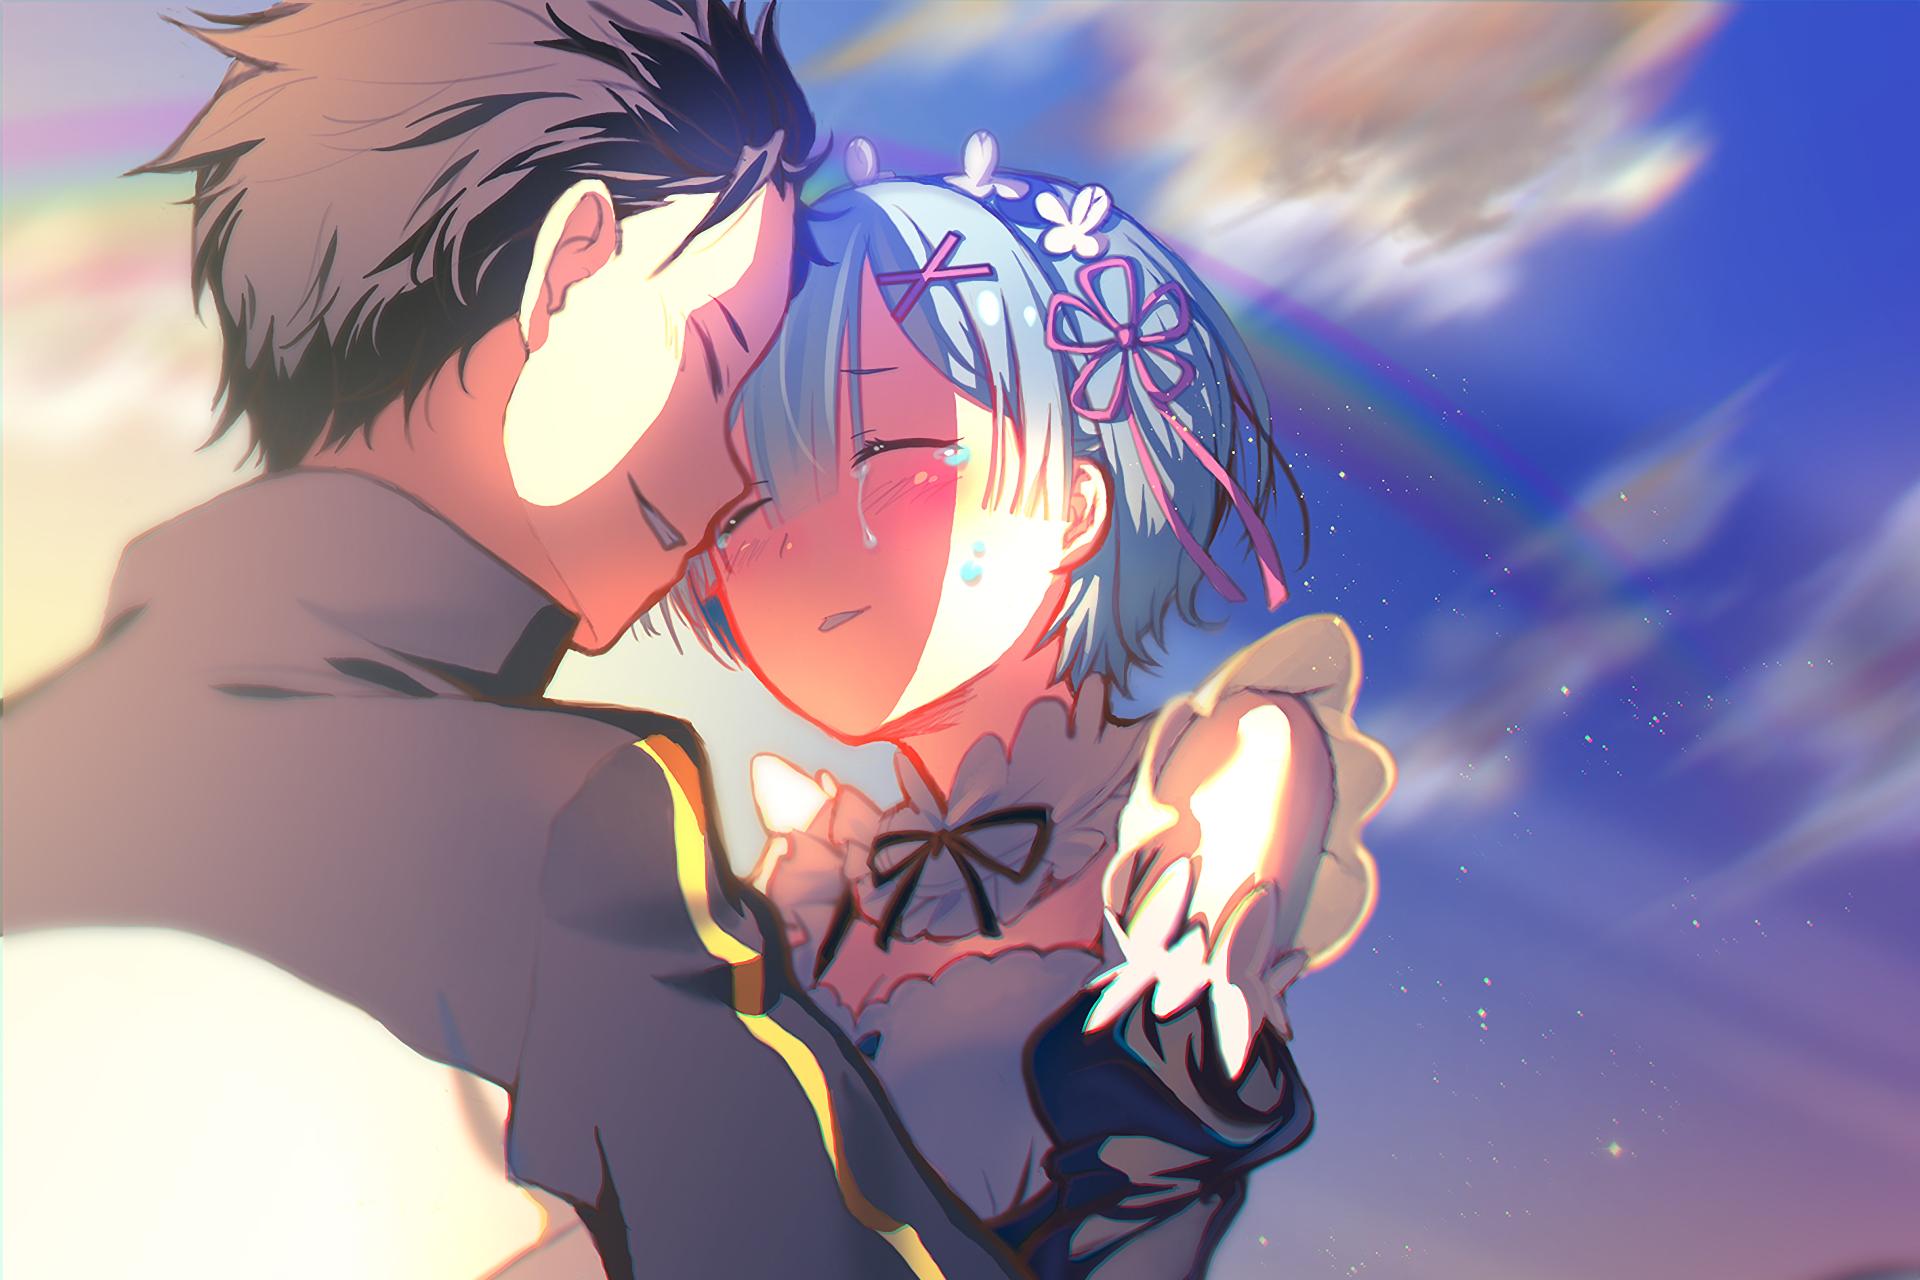 Rem Y Subaru Anime Anime Music Anime Wallpaper